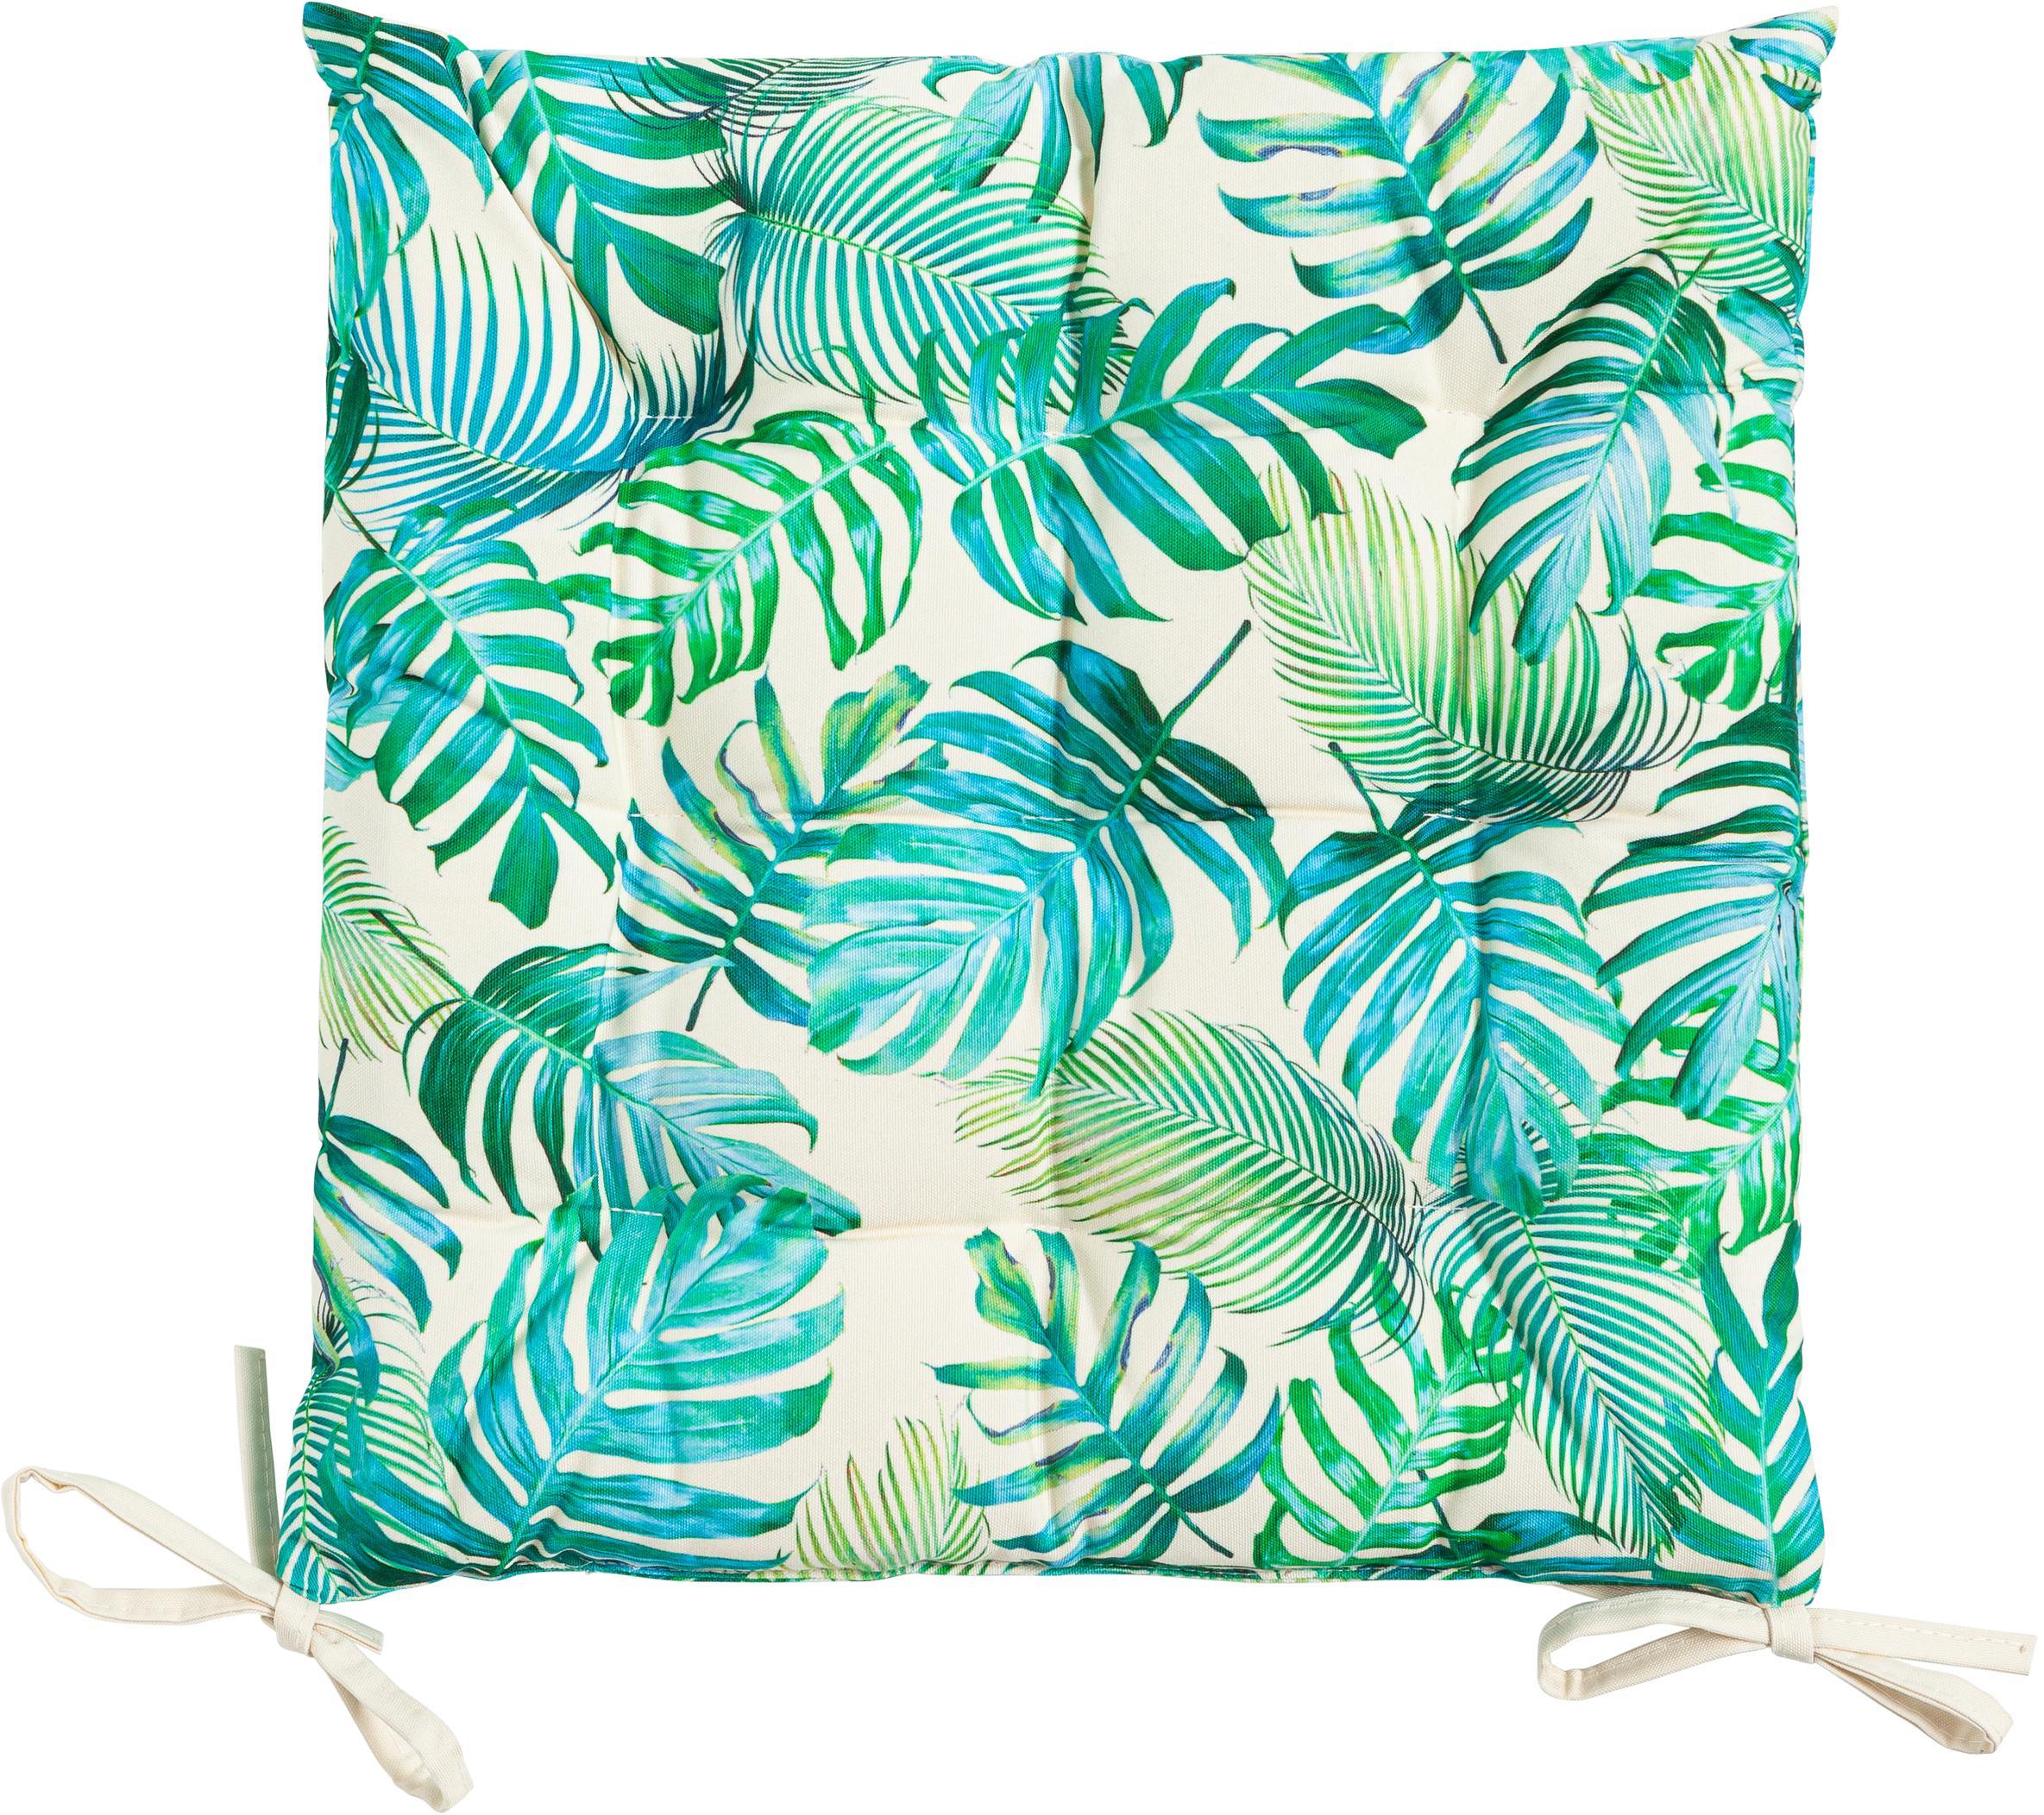 Cuscino sedia da esterno con motivo a foglie Madeira, 100% poliestere, Bianco latteo, tonalità blu, verde, Larg. 40 x Lung. 40 cm